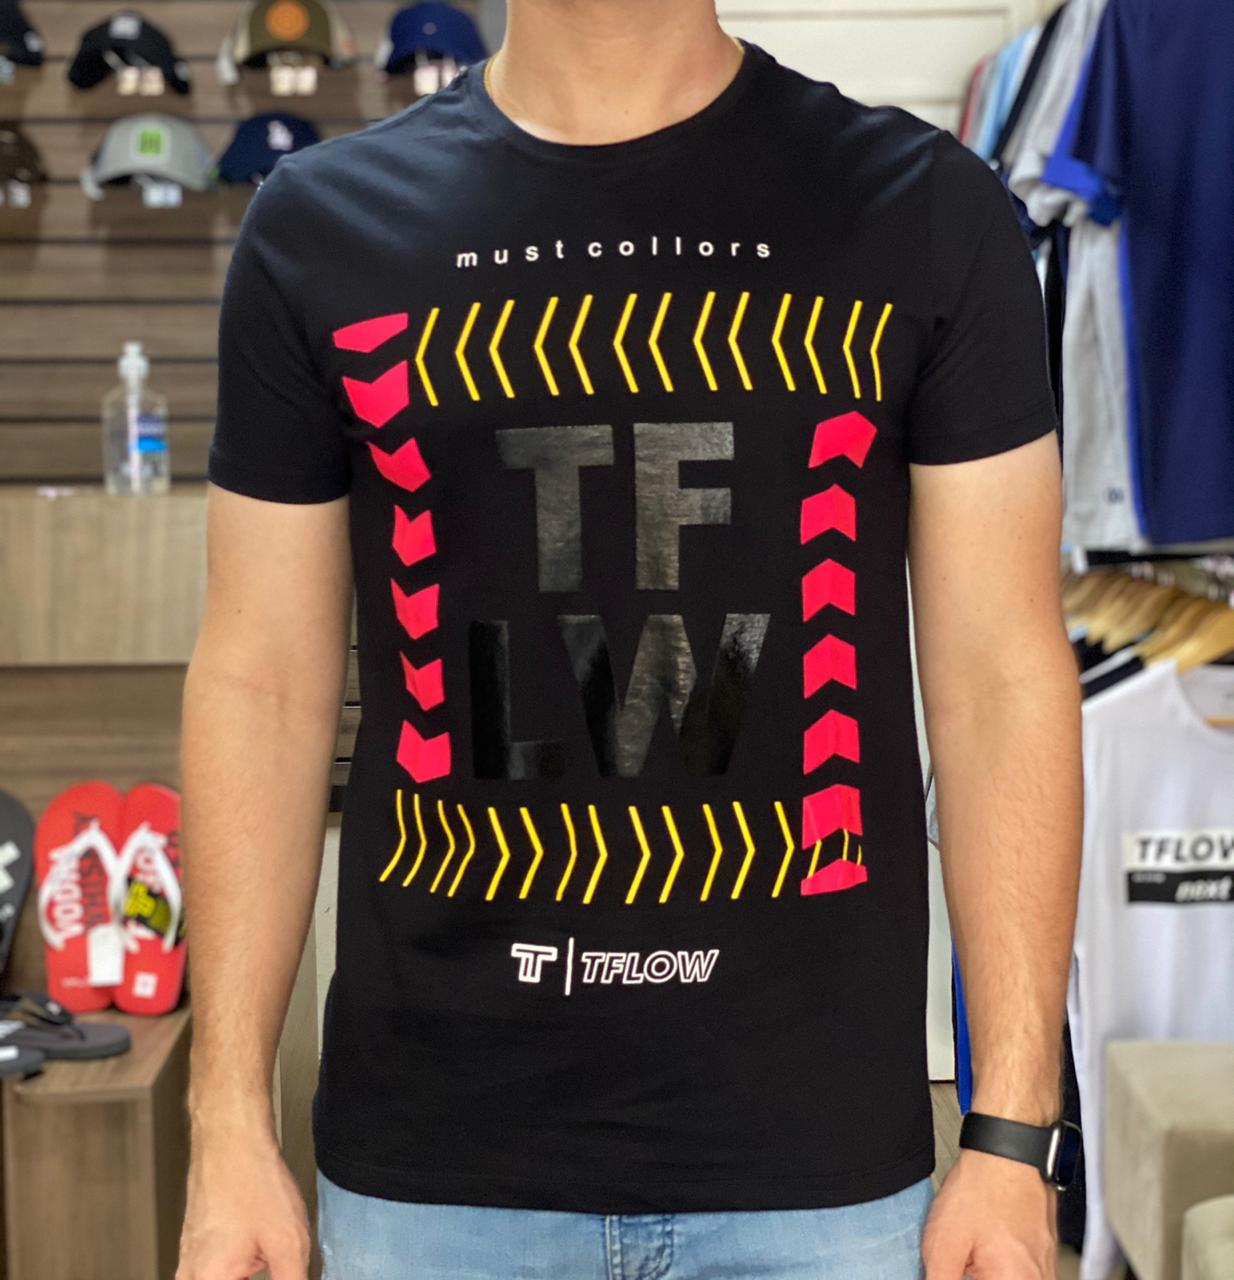 Camiseta Masculina Tflow Algodão Lisa - Branco